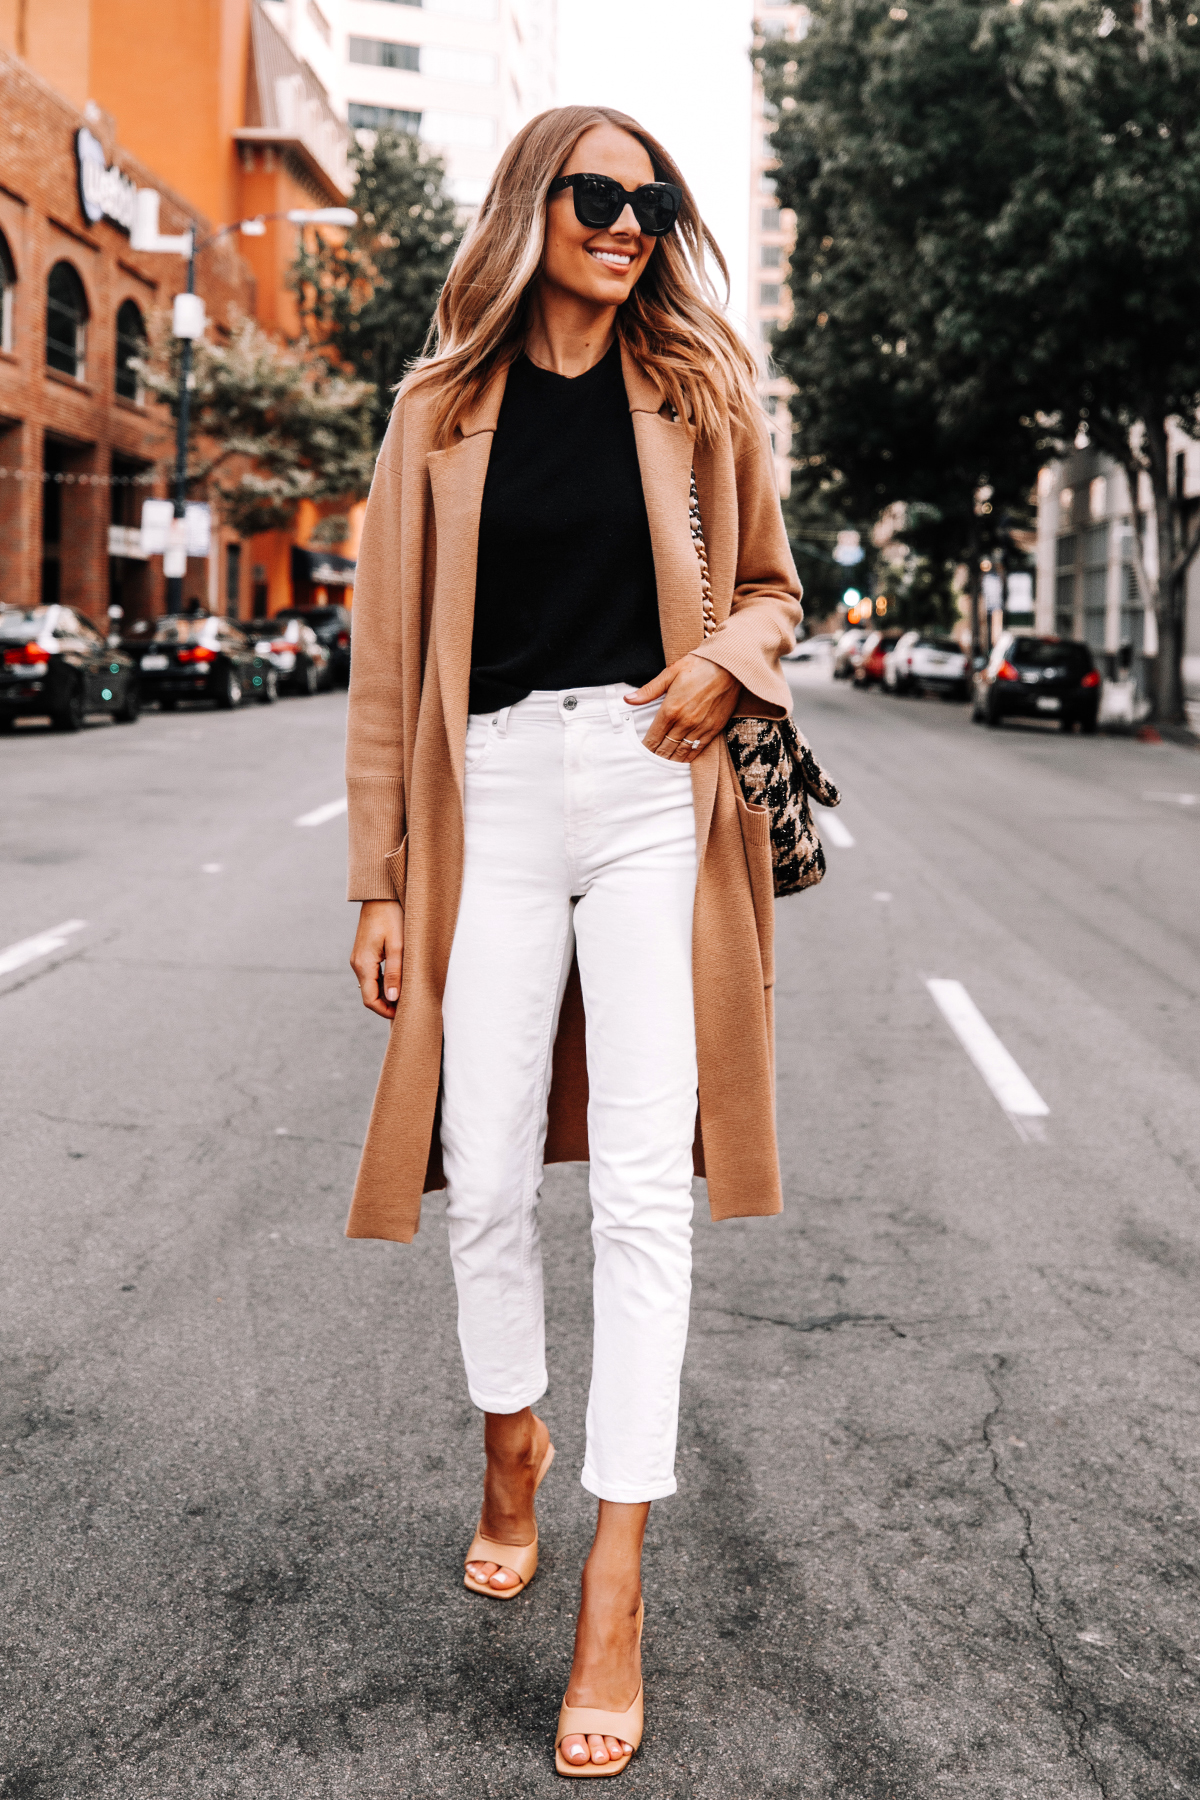 Fashion Jackson Wearing Jcrew Camel Coatigan Black Sweater Everlane White Jeans Tan Heeled Sandals